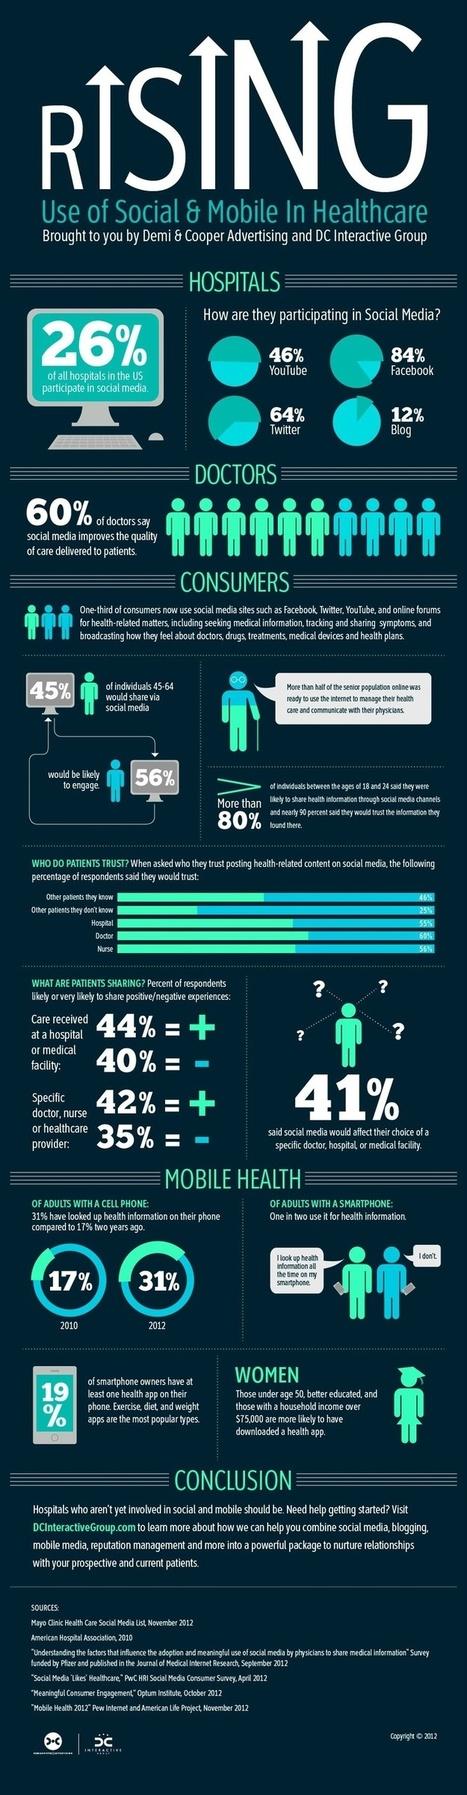 Addiction Treatment Social Marketing in Healthcare | Addiction Treatment Marketing | Scoop.it